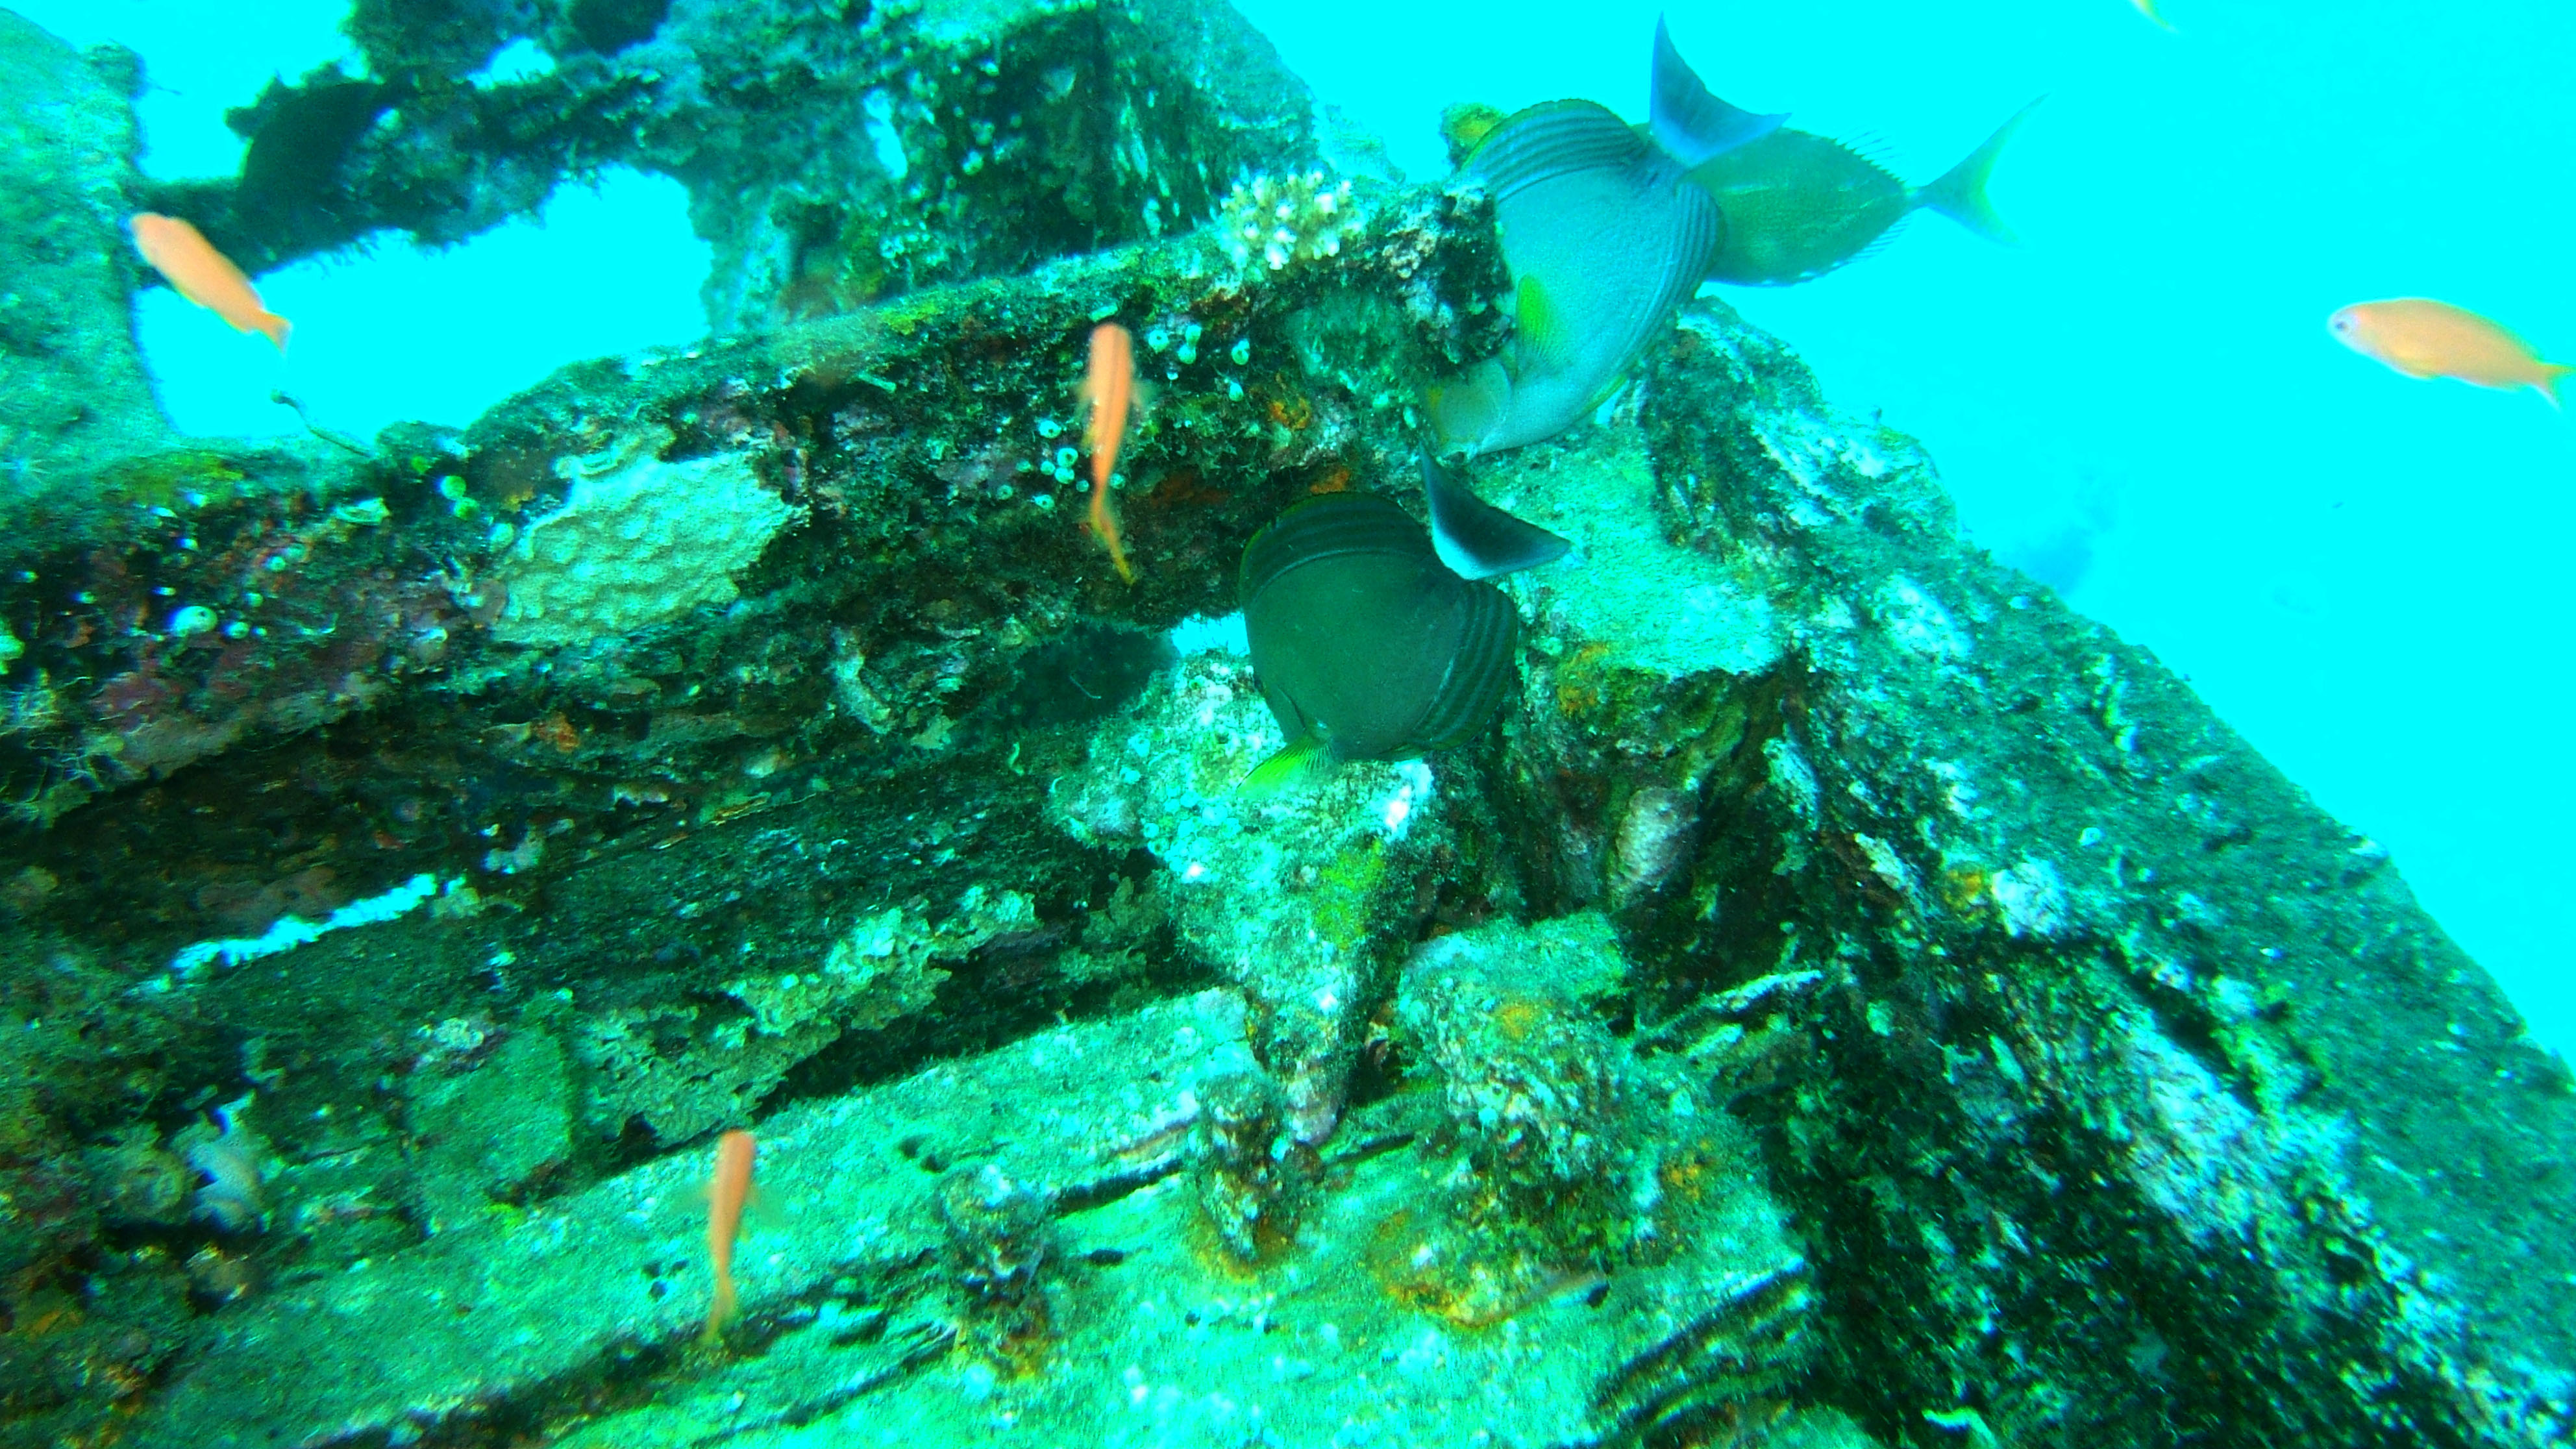 Dive 8 Philippines Mindoro Sabang Junk Nov 2005 13